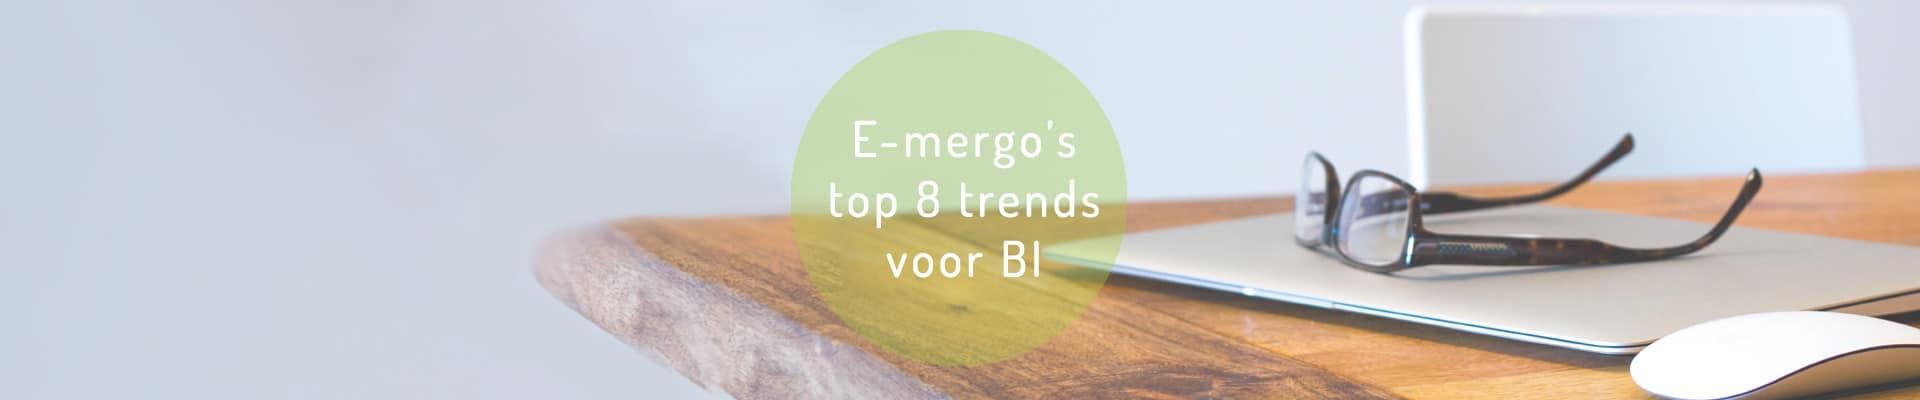 business intelligence,qlik,bi trends,business intelligence trends,e-mergo.nl